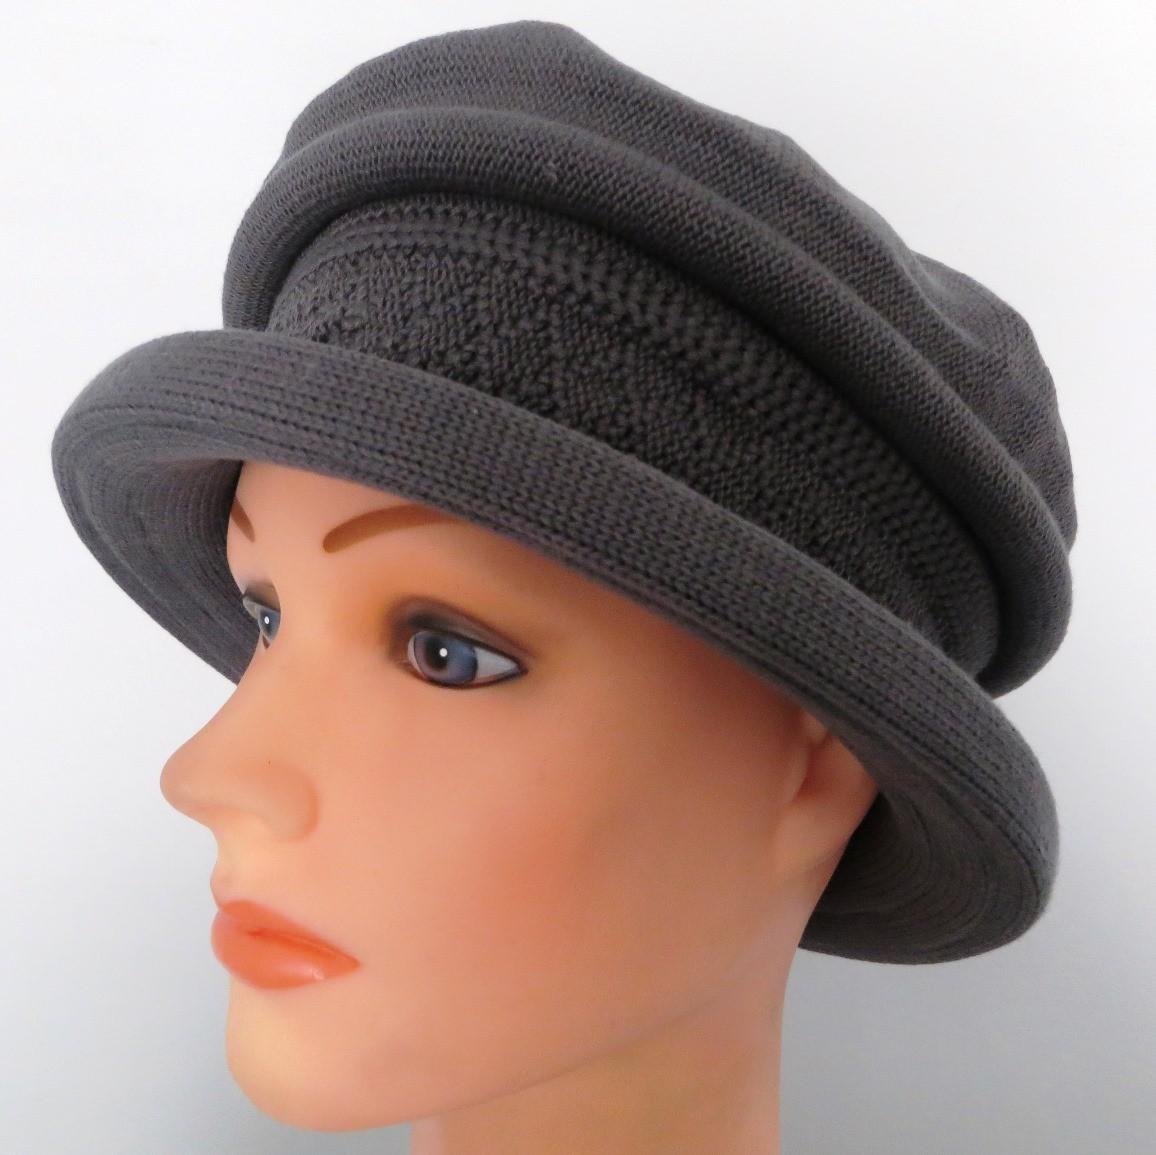 Cotton beret hat gray